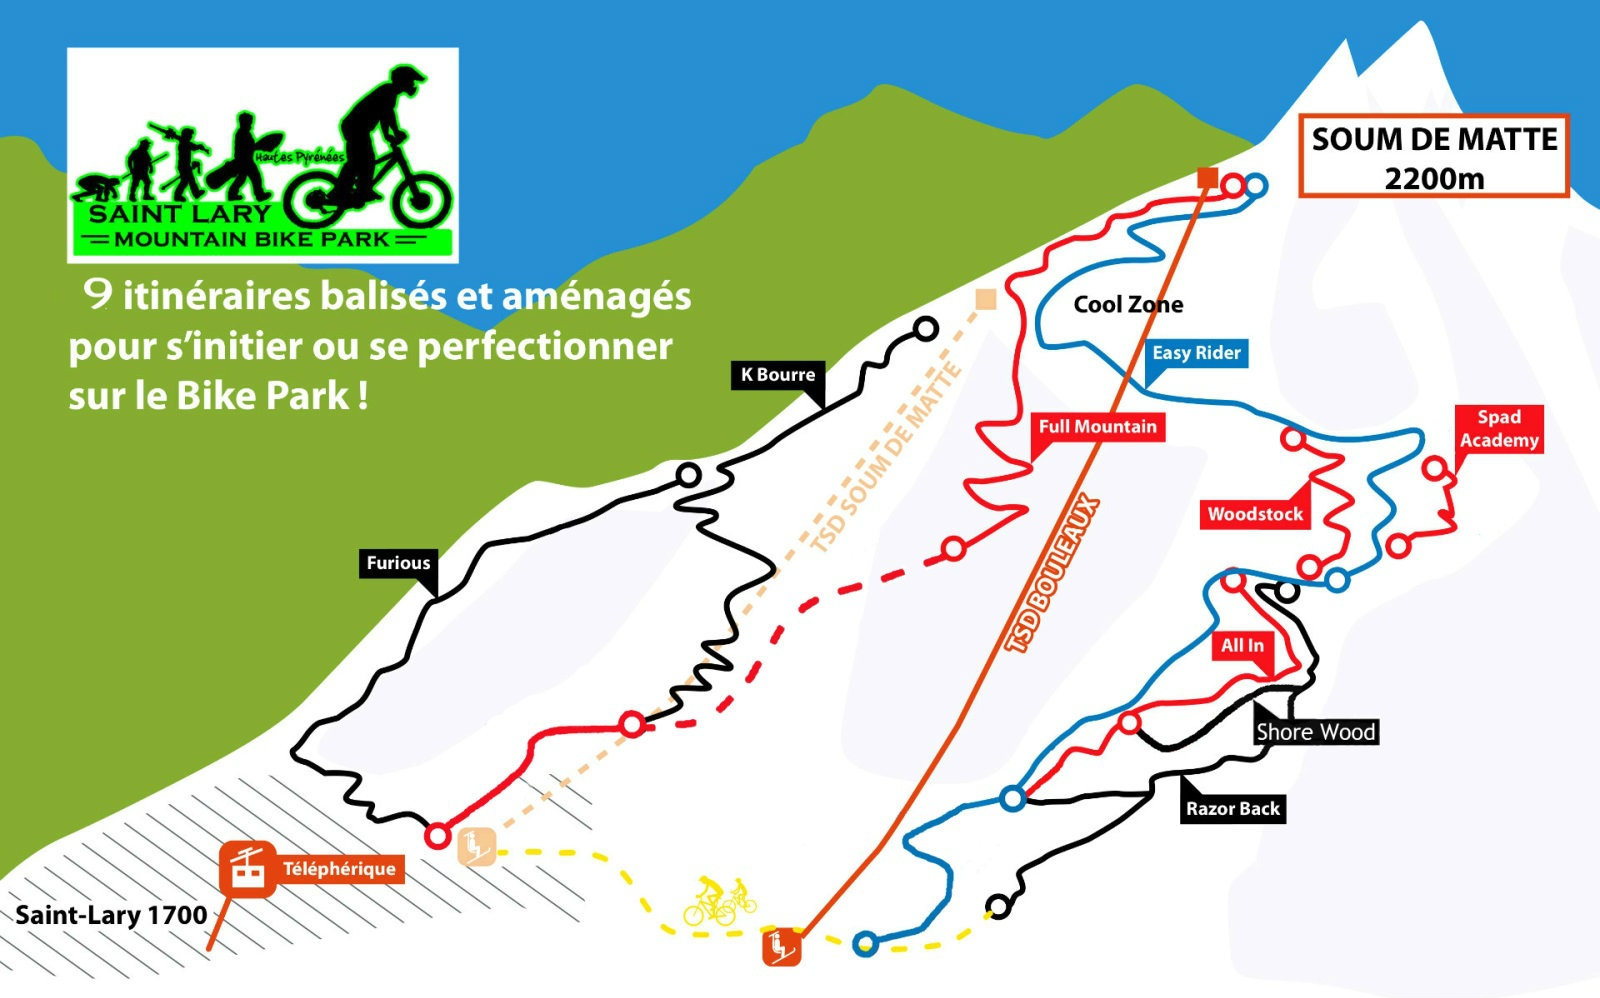 Saint-Lary Mountain Bike Park